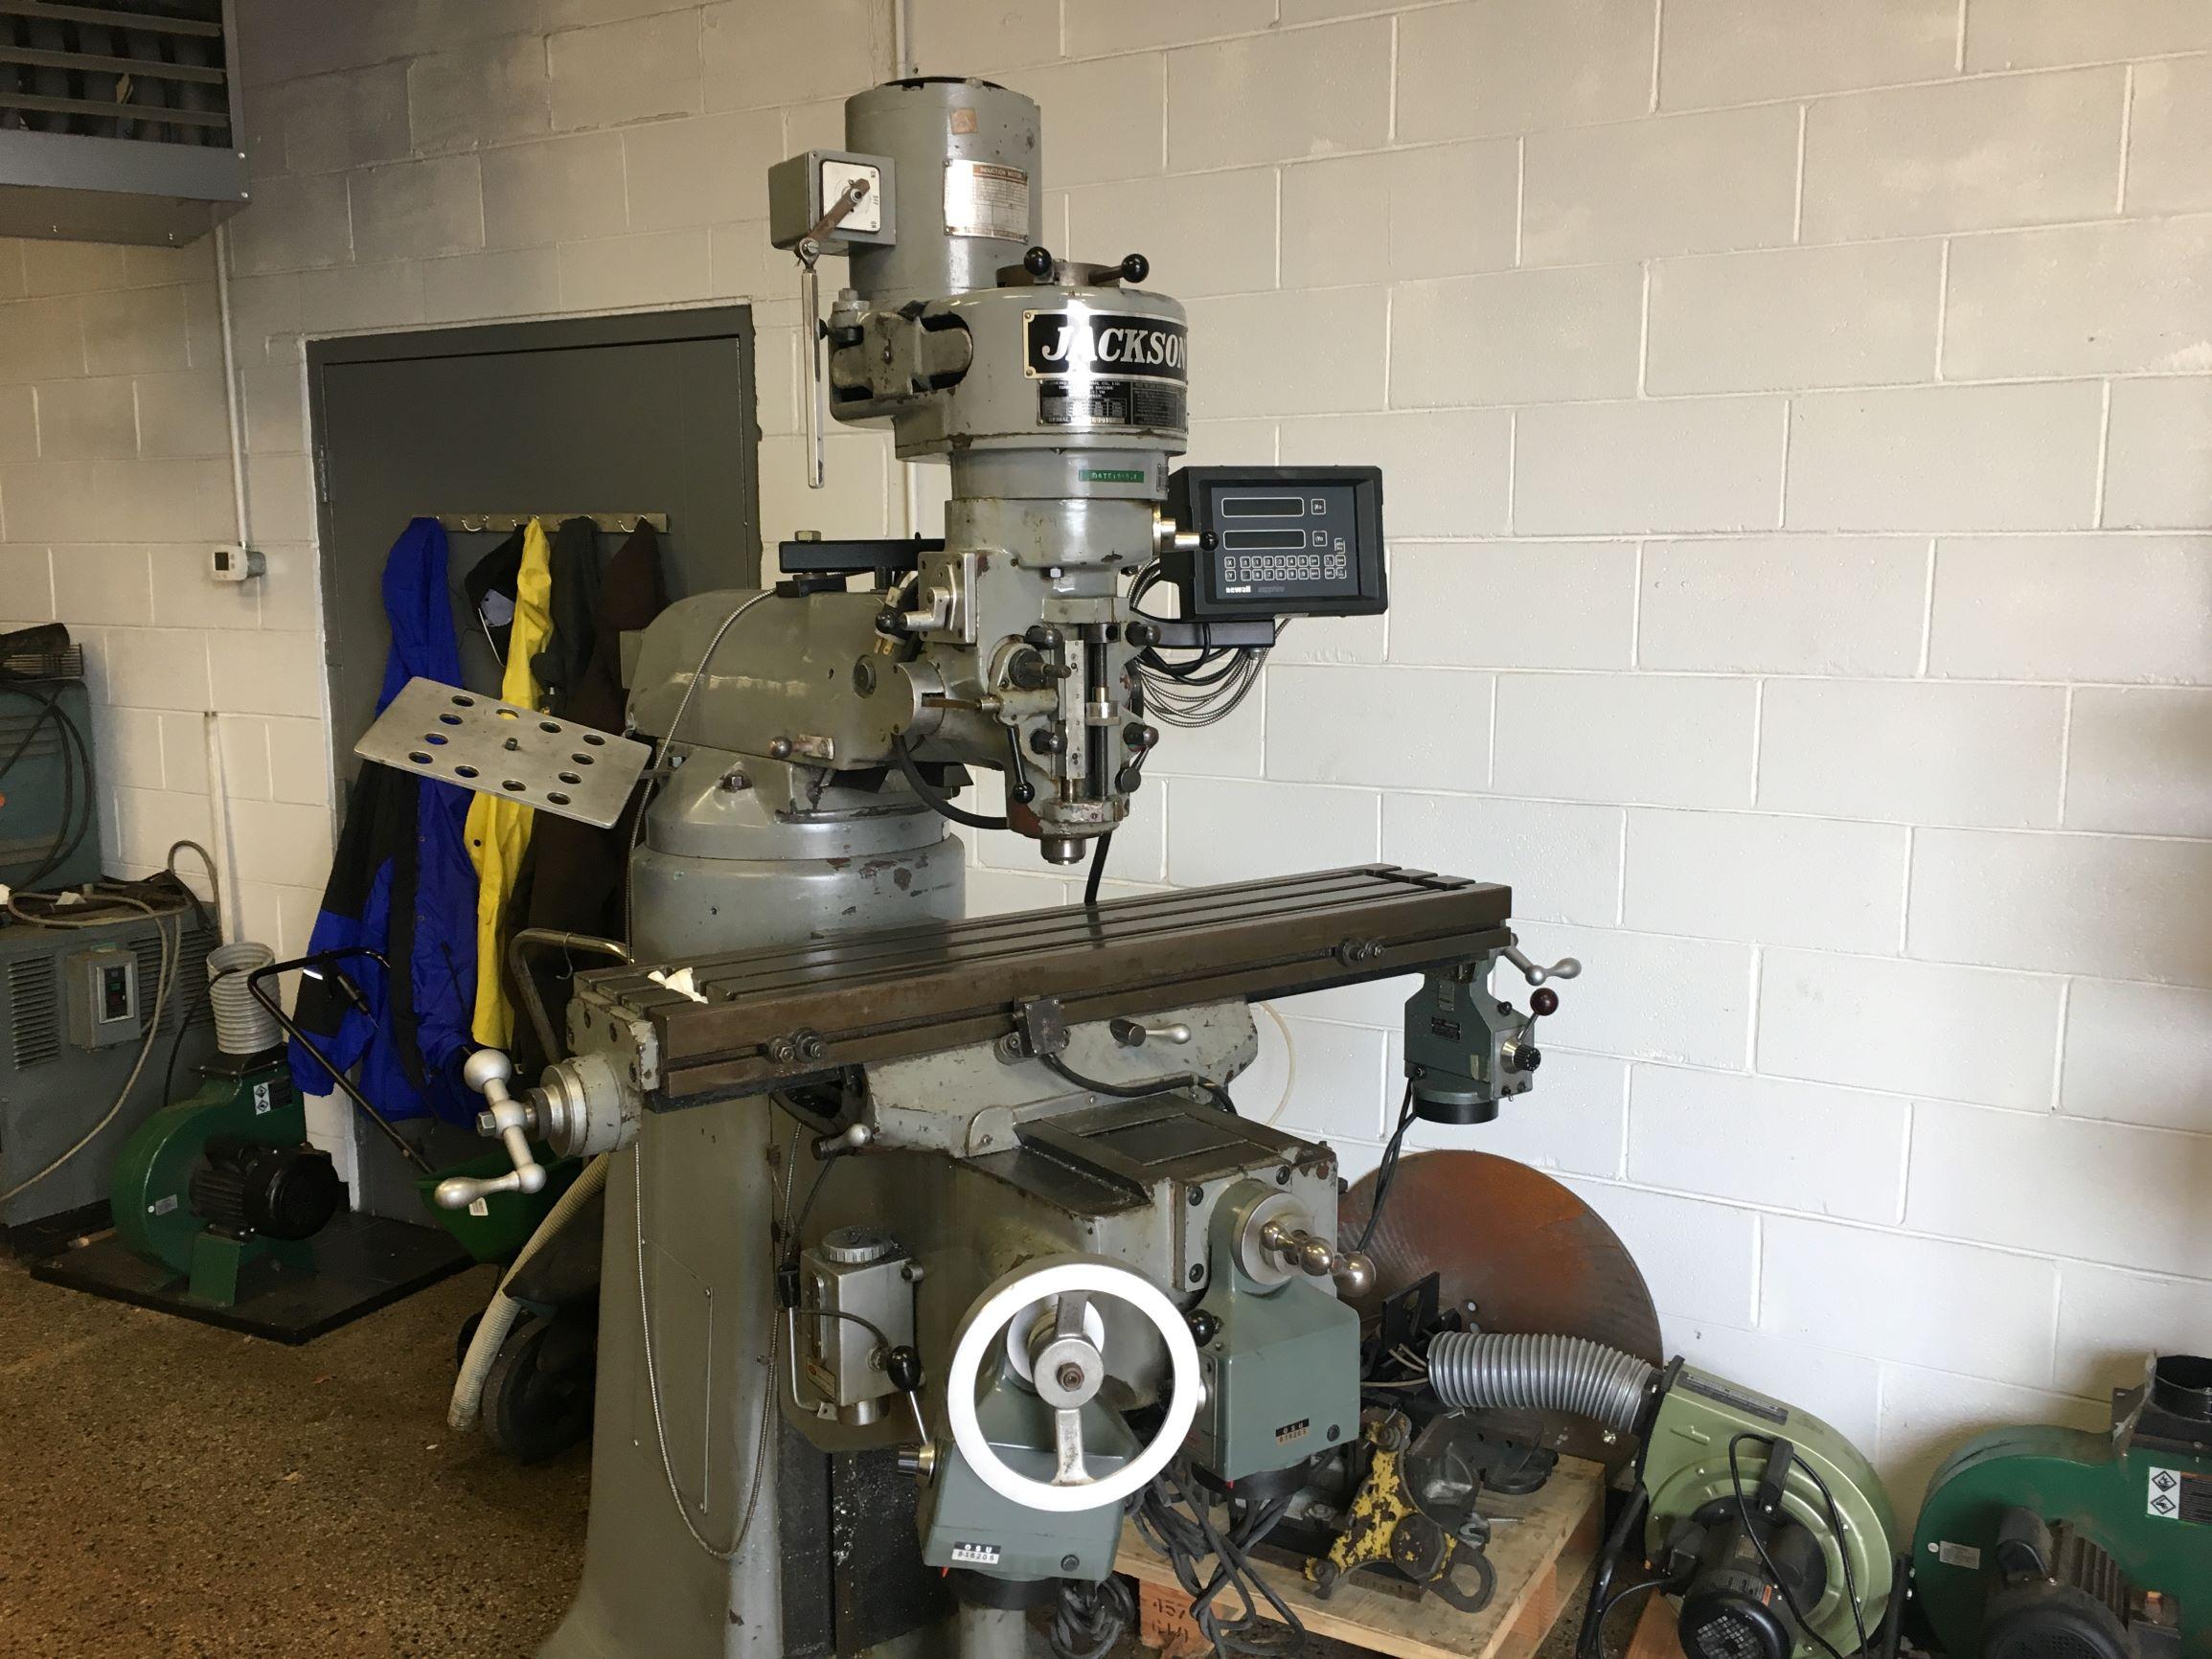 JACKSON (Cheng Ki) Model CK 1-1/2TM Step Pulley Vertical Mill, S/N 690157, New 1980.